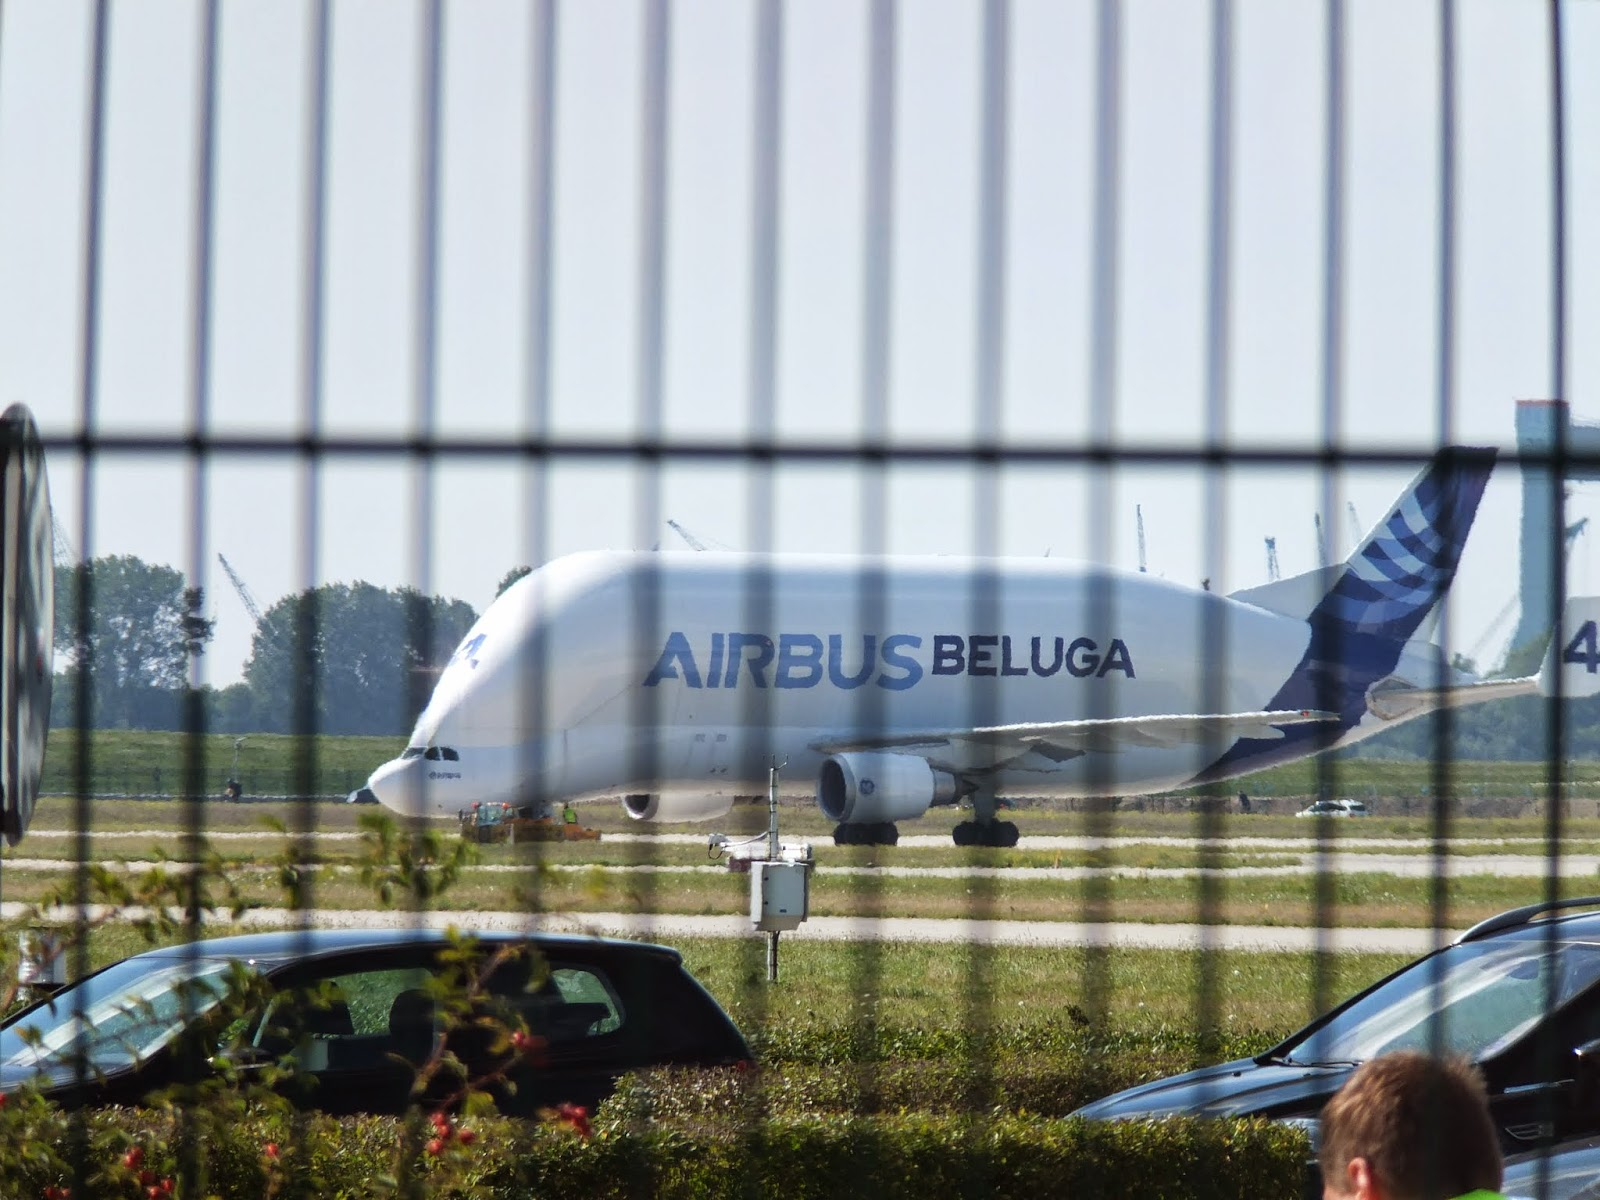 AIRBUS-BELUGA-no.4-Airplane エアバスベルーガ4号機